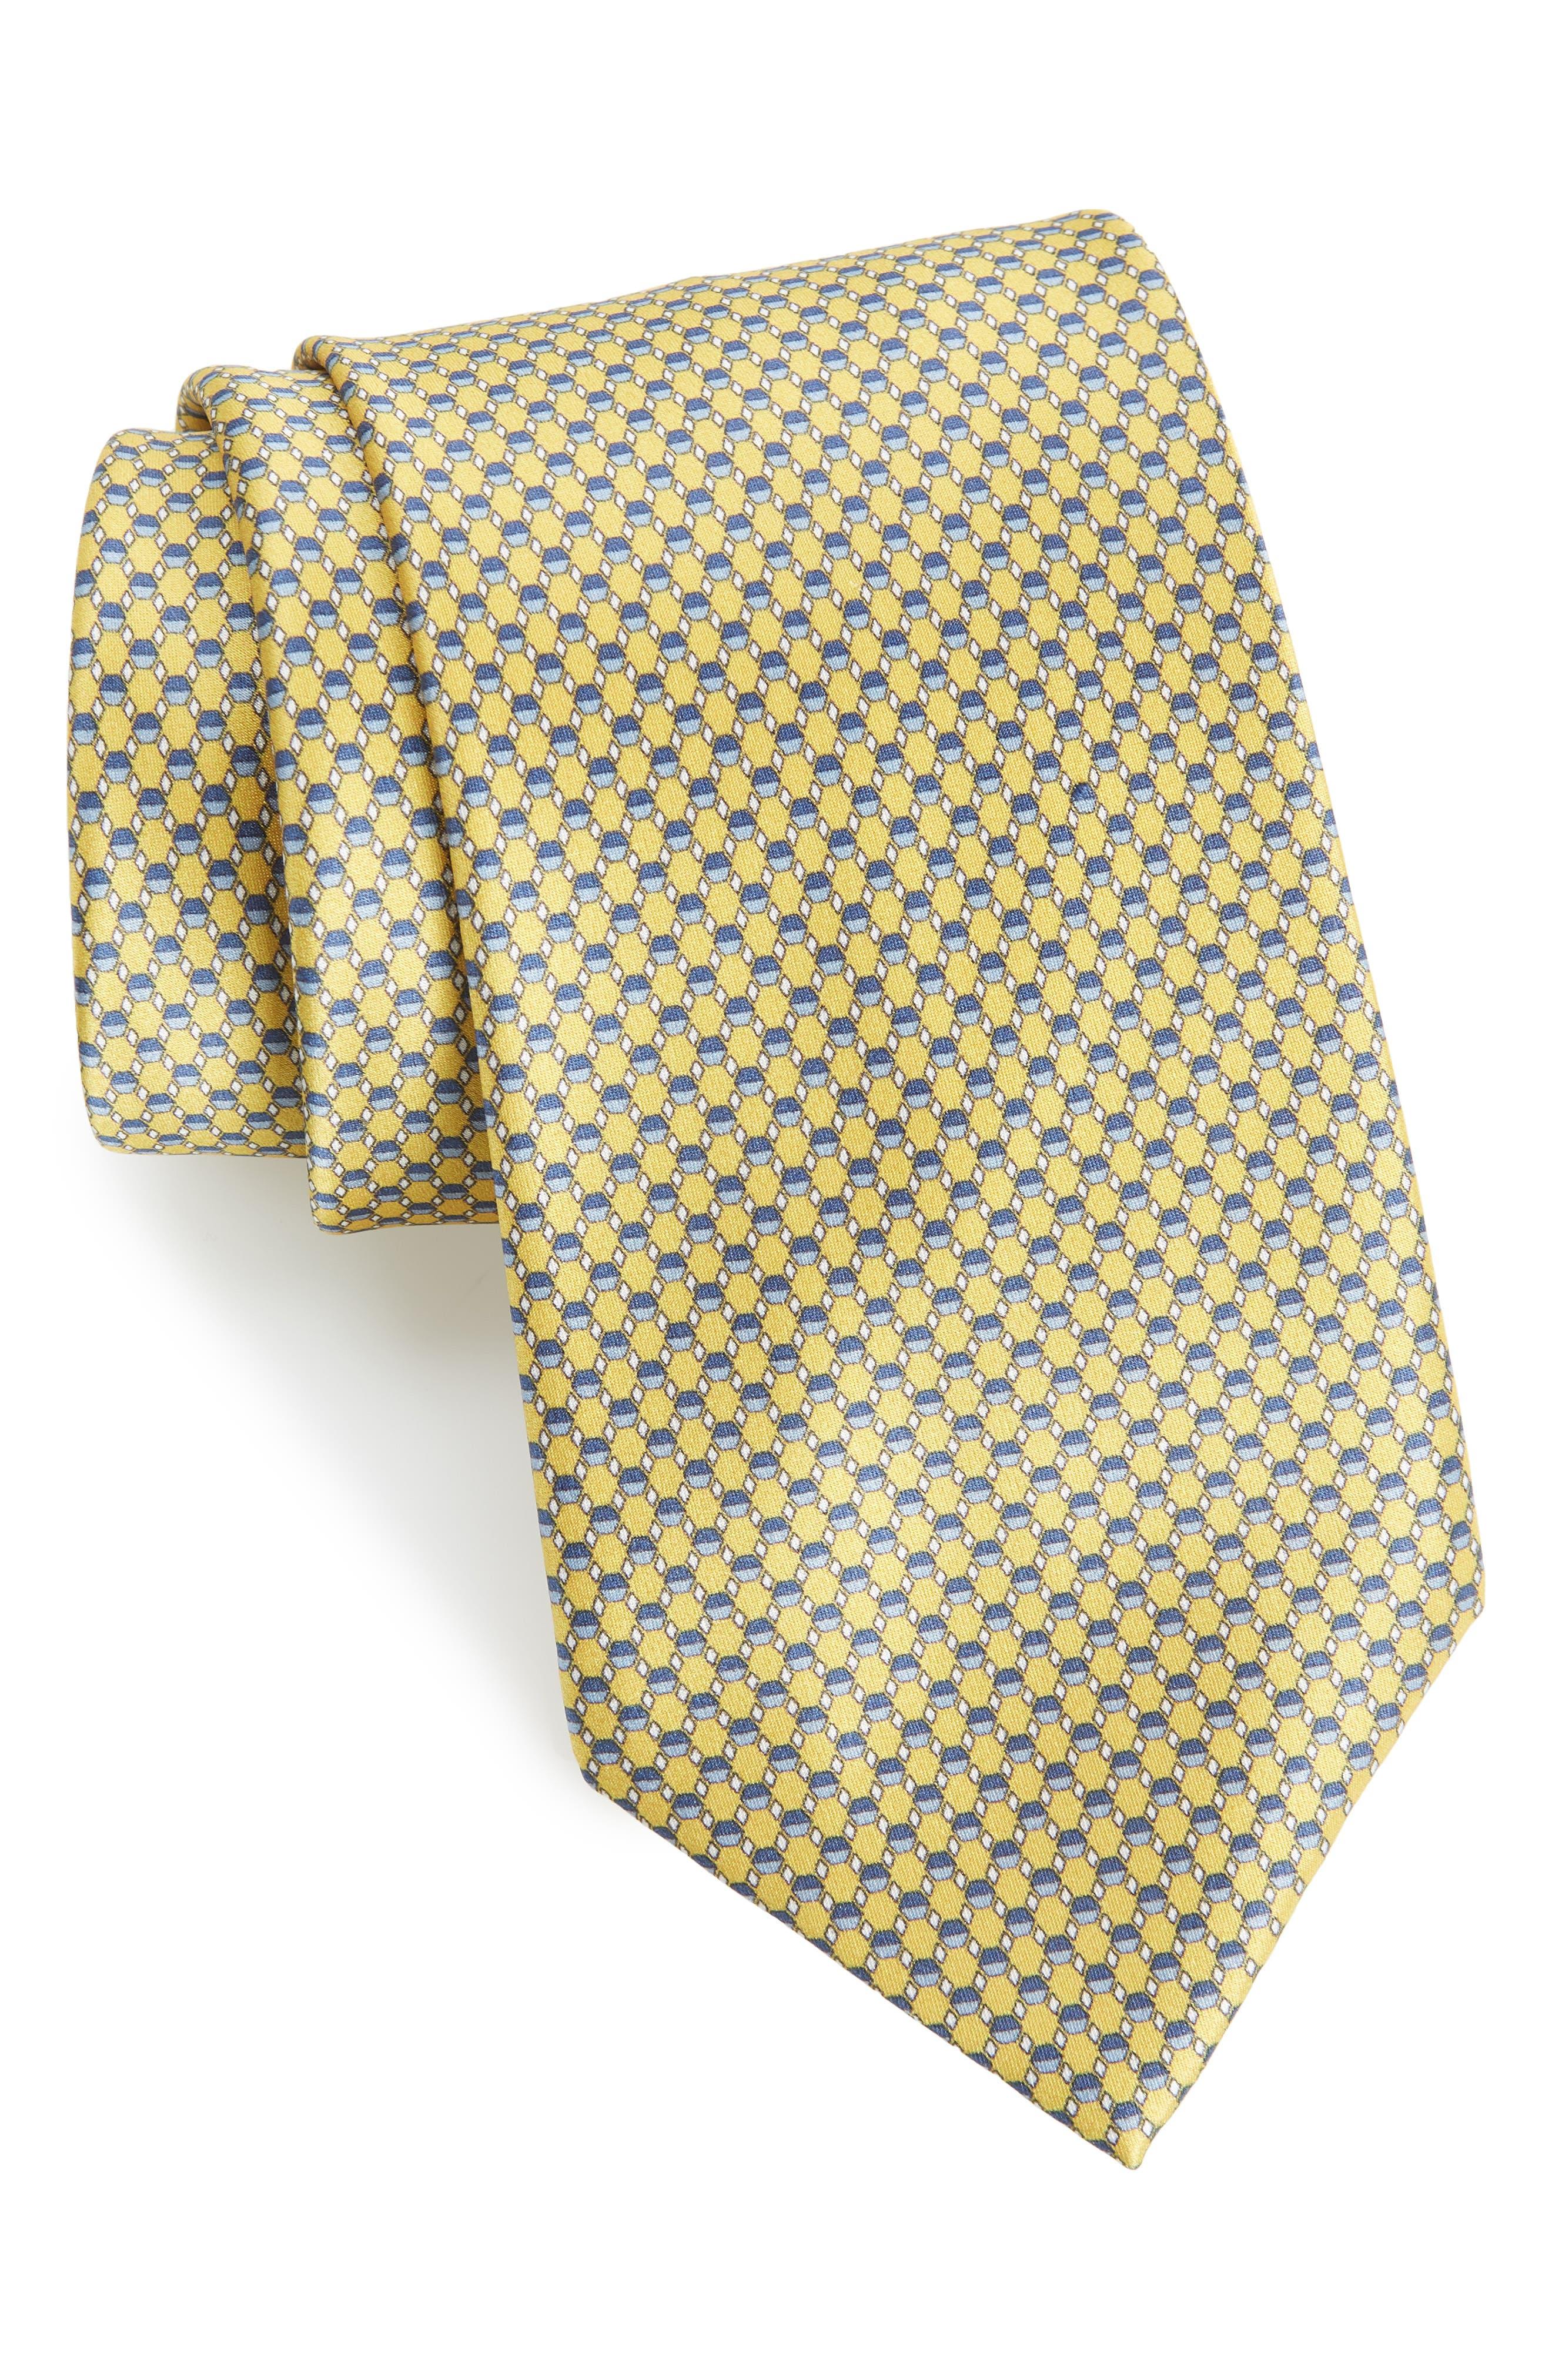 Geometric Silk Tie,                             Main thumbnail 1, color,                             YELLOW/ BLUE